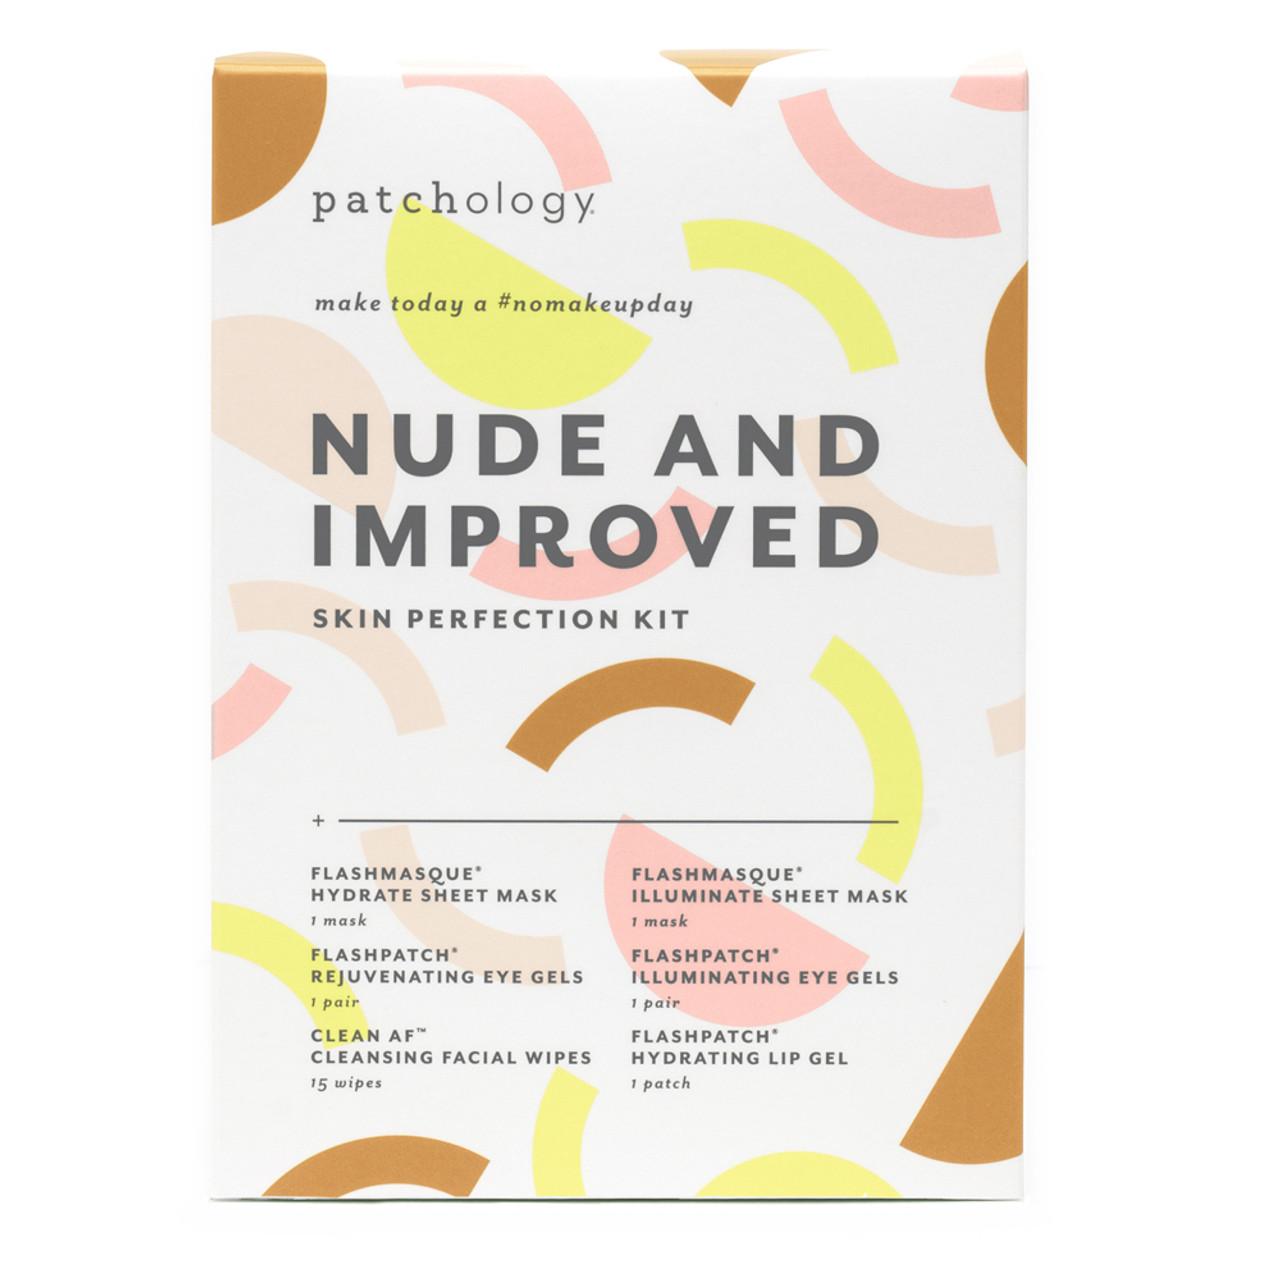 Patchology Nude & Improved Kit